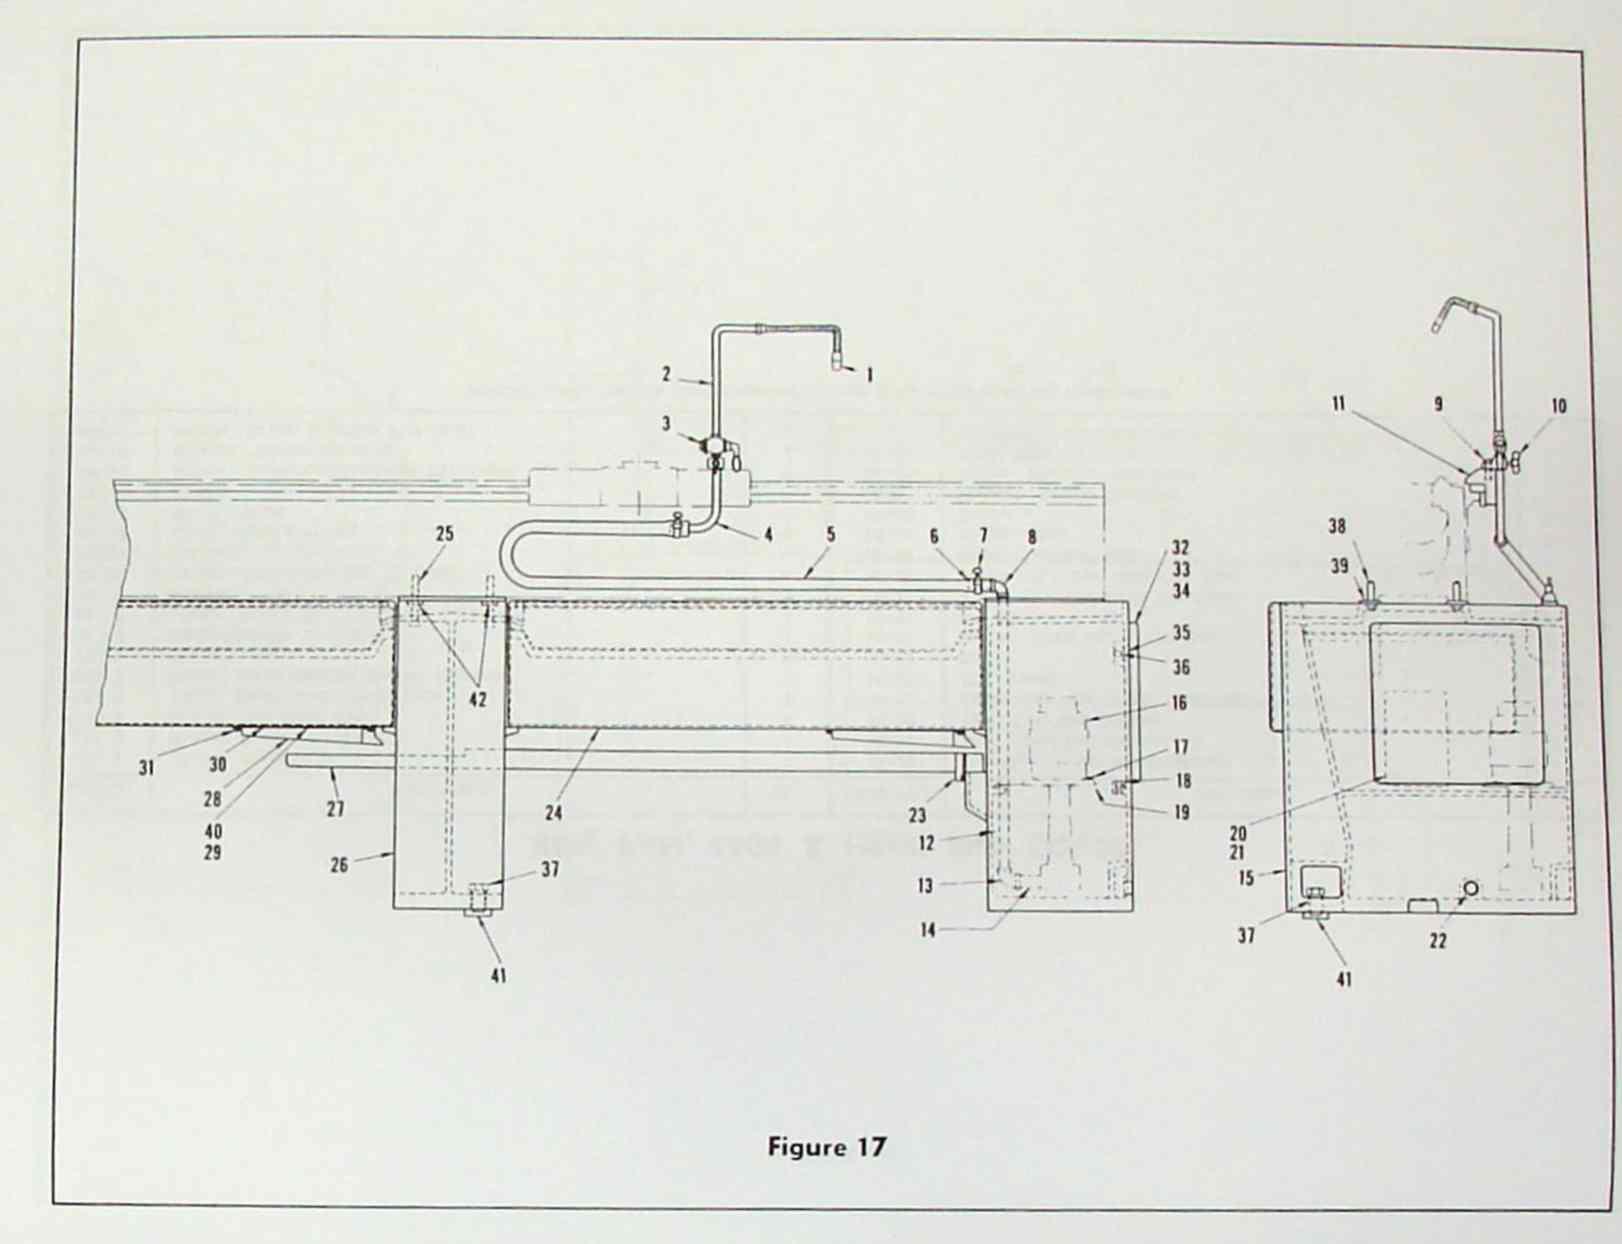 hight resolution of leblond regal 13 15 17 19 lathe manual 3903